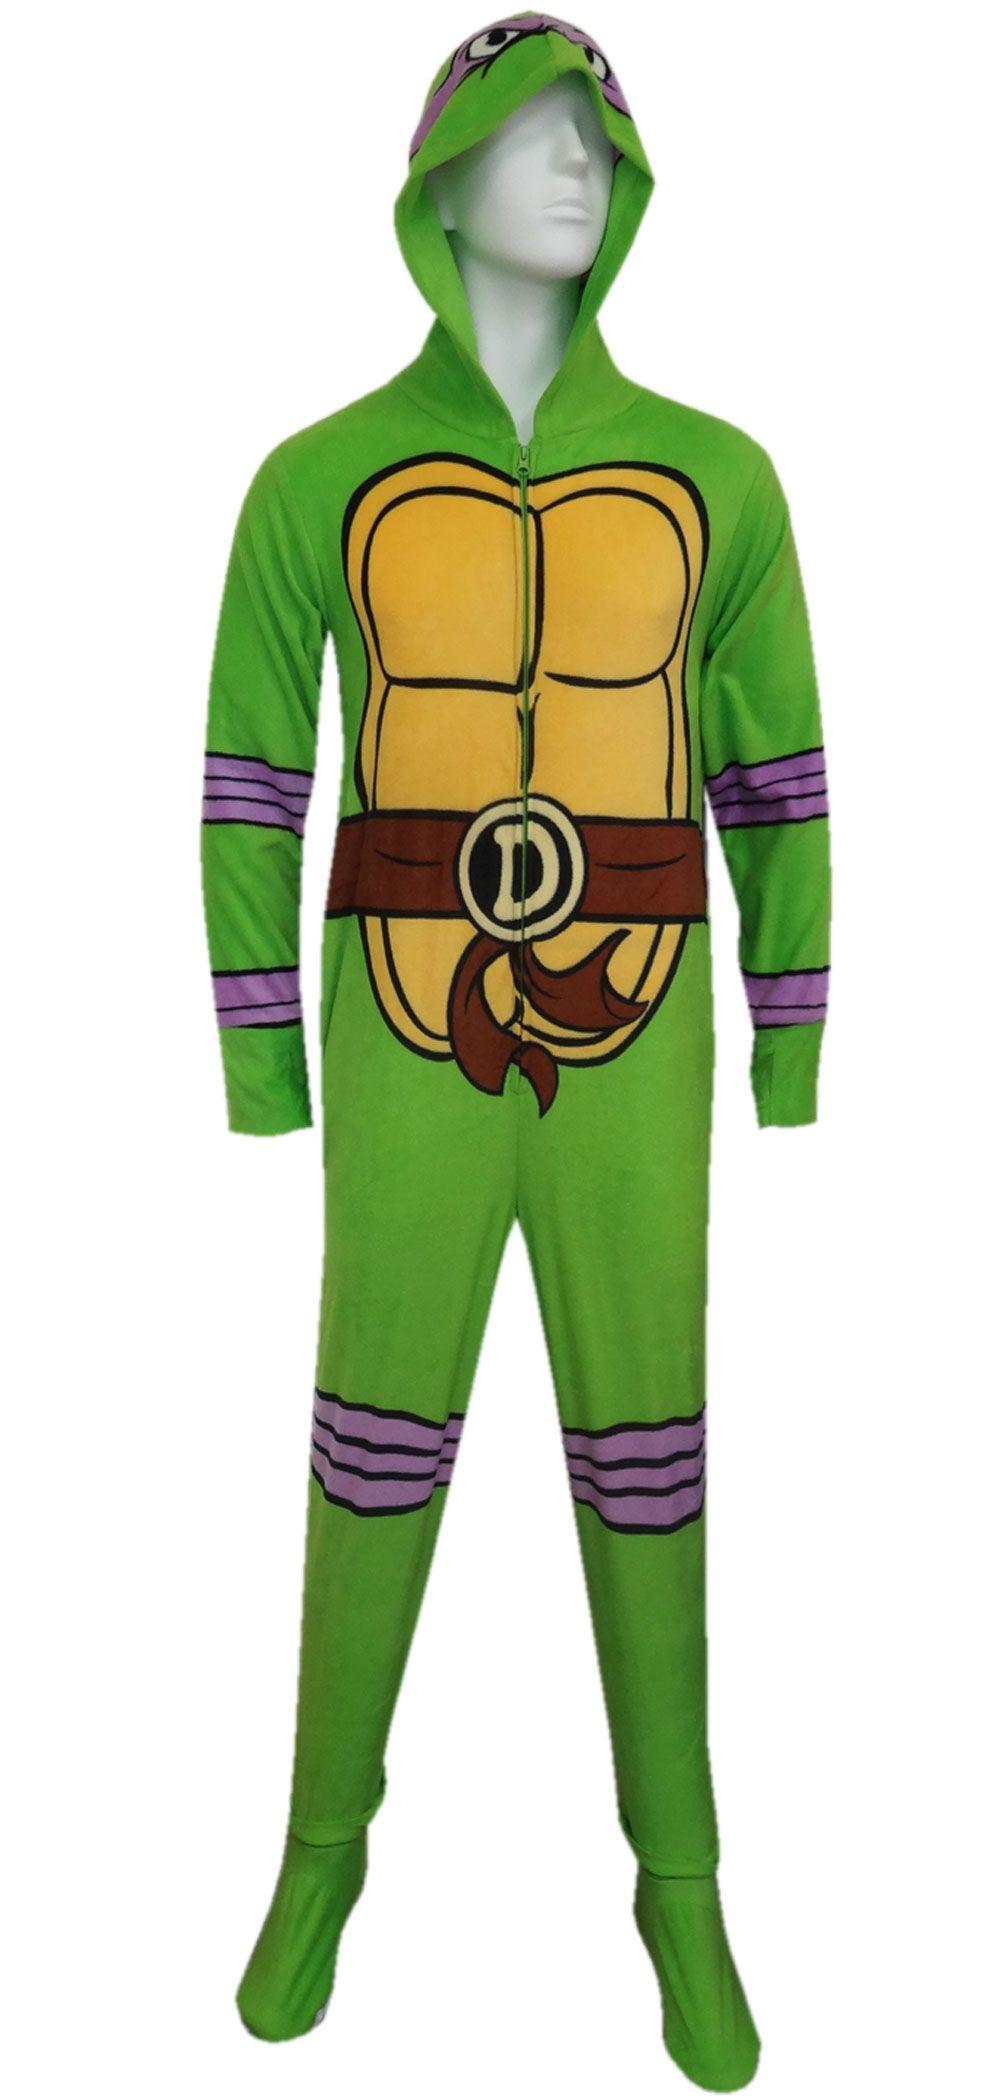 e6d0fb668f Onesie. Onesie Ninja Turtle Onesie